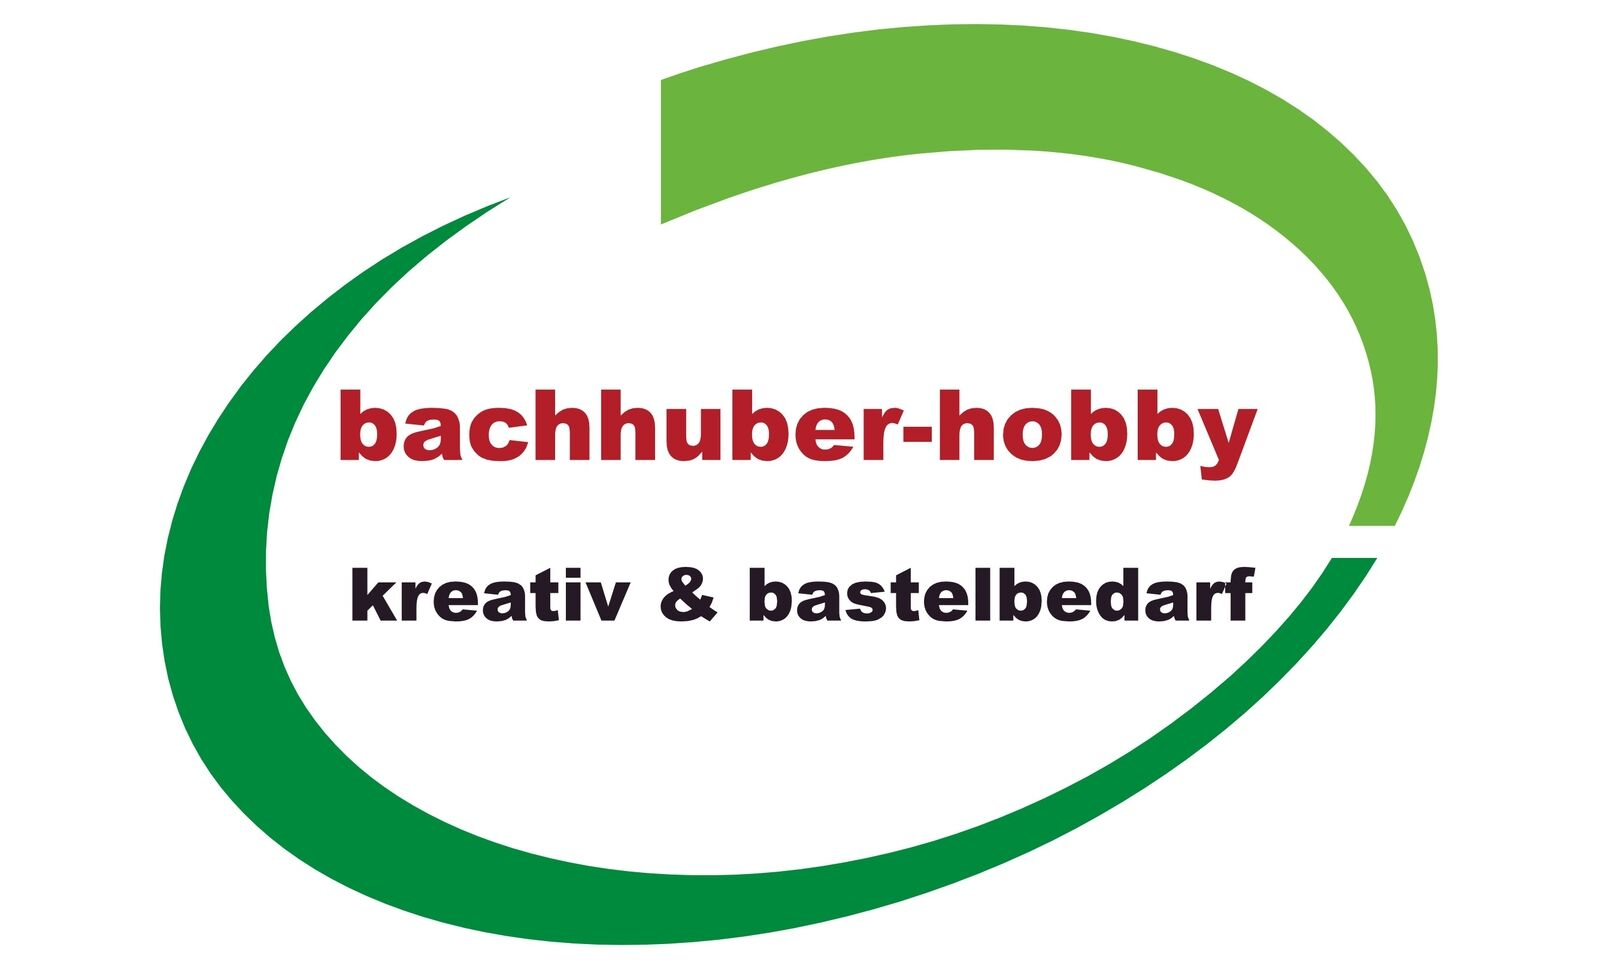 bachhuber-hobby-shop